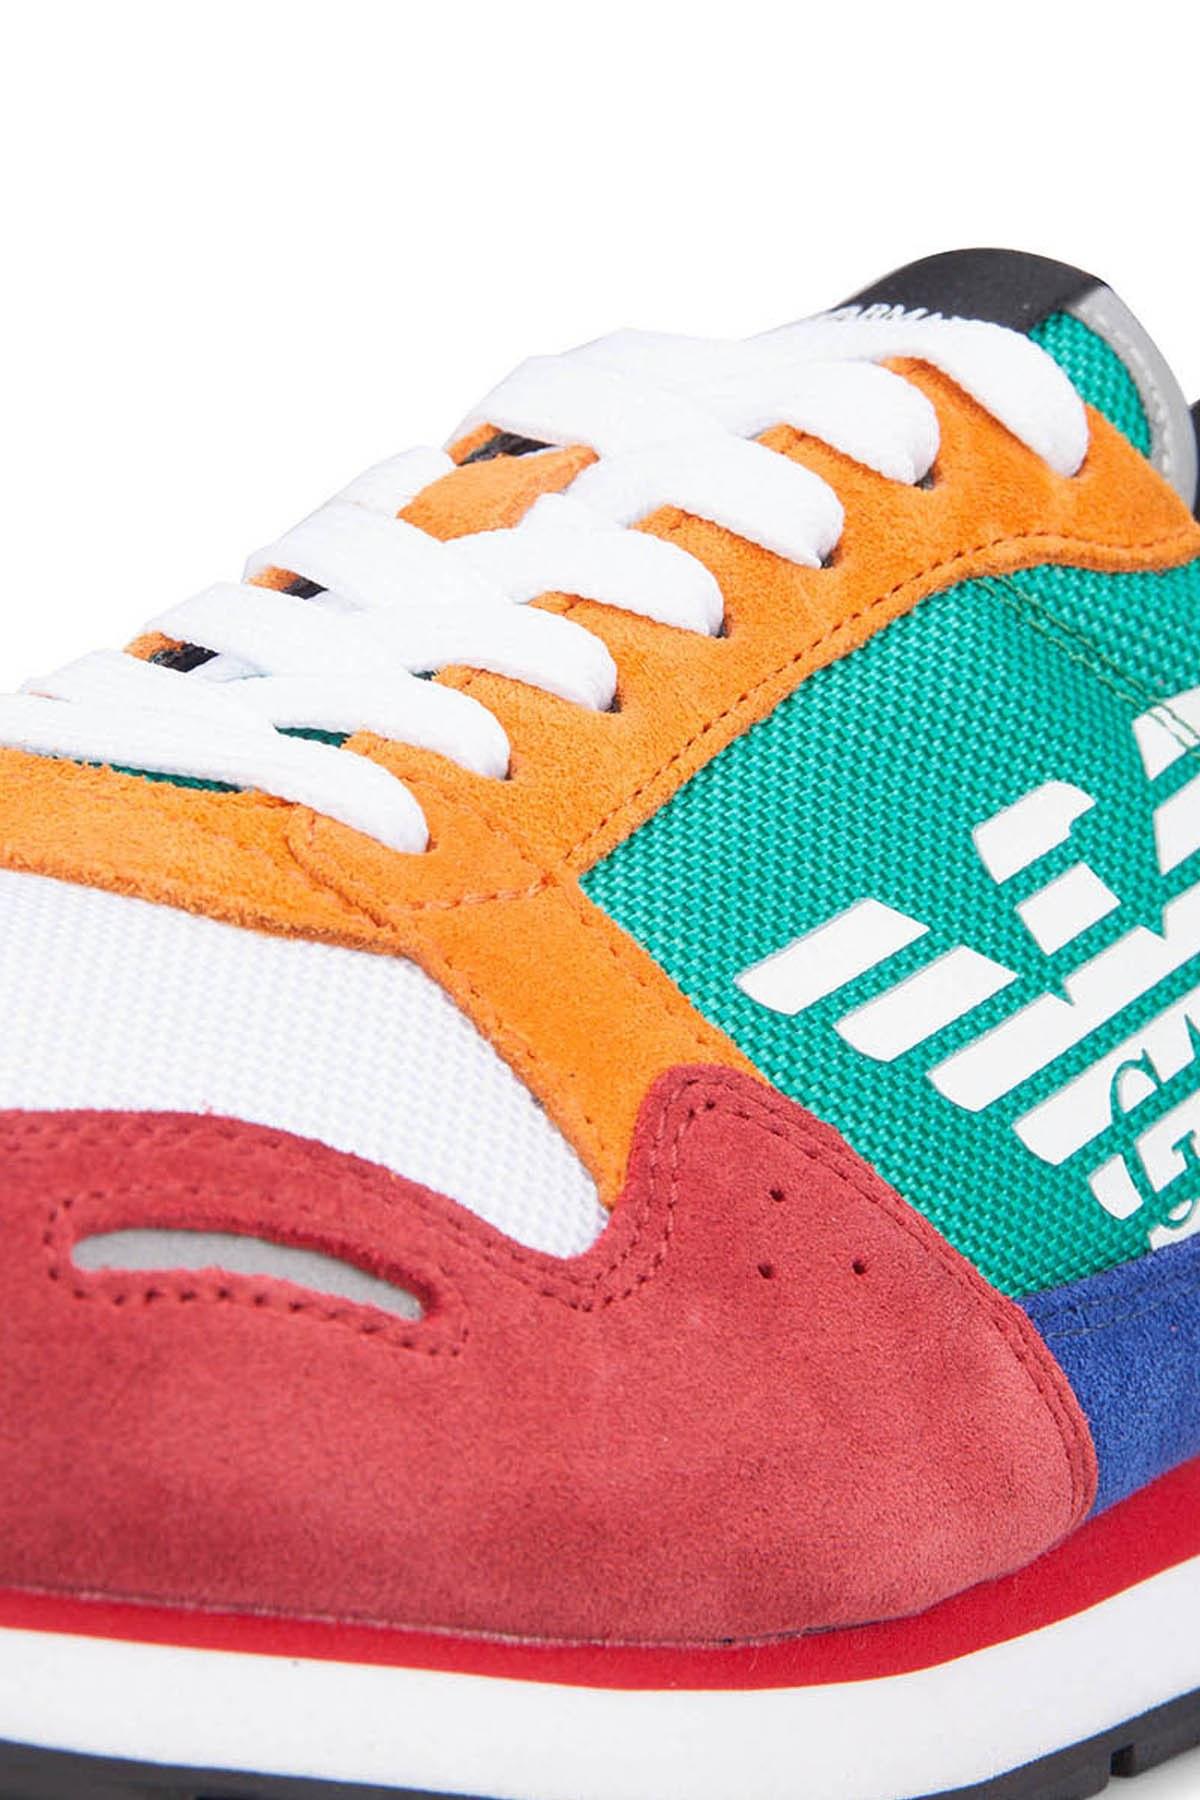 Emporio Armani Erkek Ayakkabı S X4X215 XL200 A005 KIRMIZI-YEŞİL